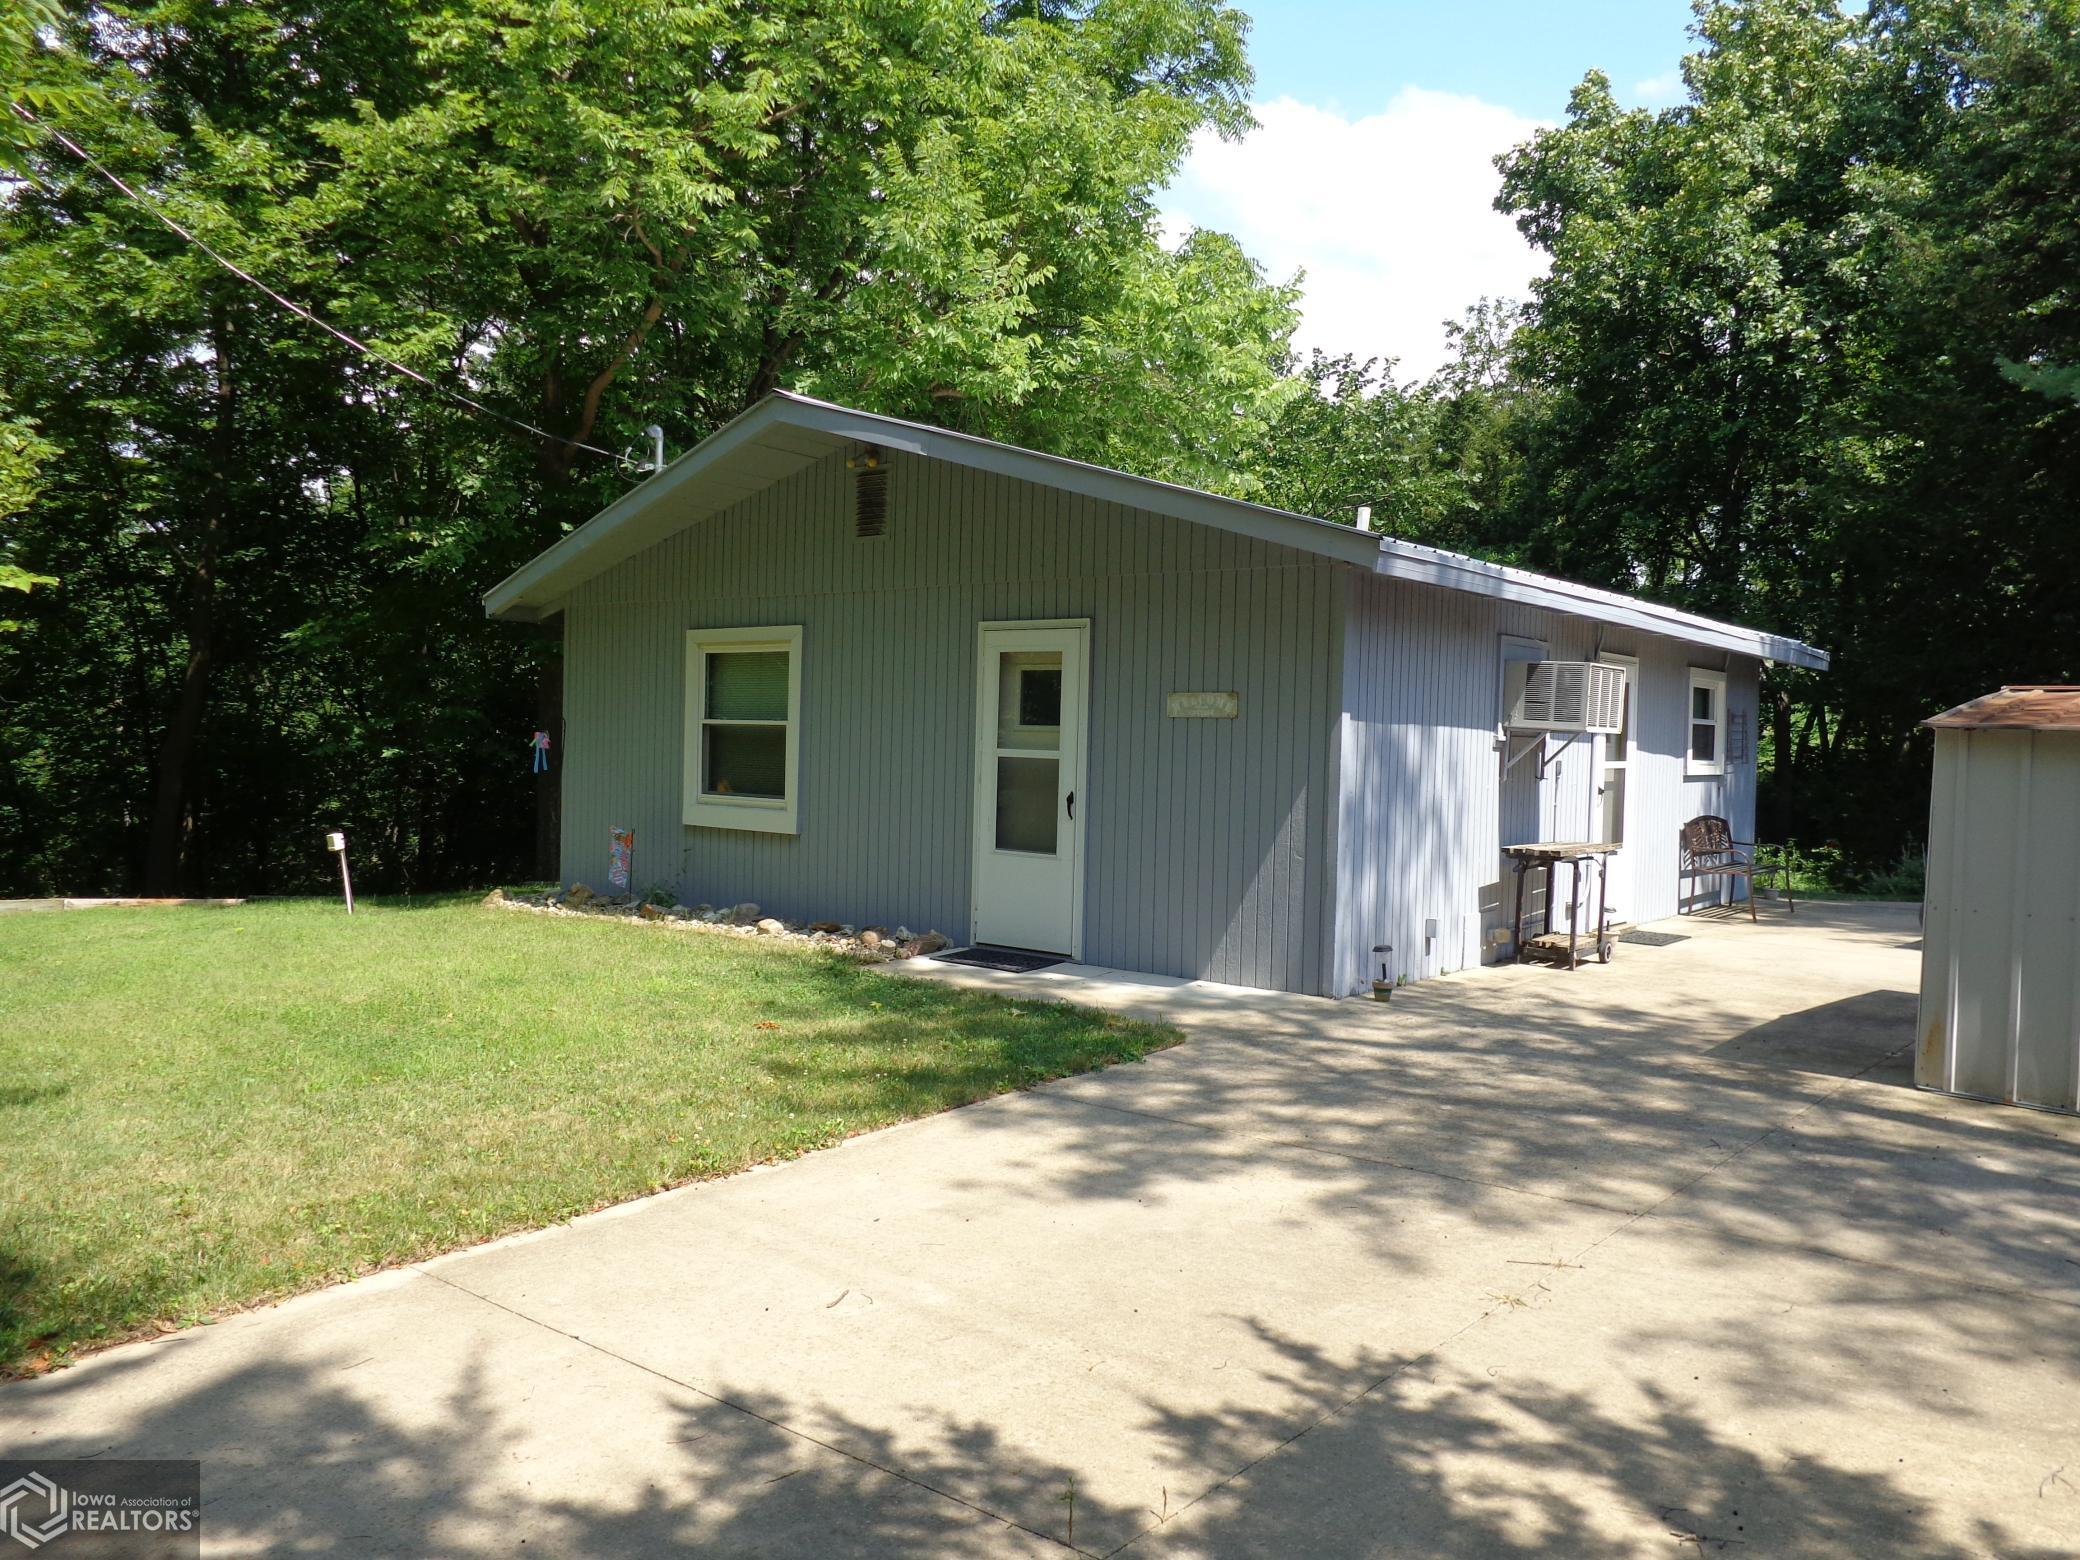 1230 Park, Brooklyn, Iowa 52211-3035, 2 Bedrooms Bedrooms, ,1 BathroomBathrooms,Single Family,For Sale,Park,5731616